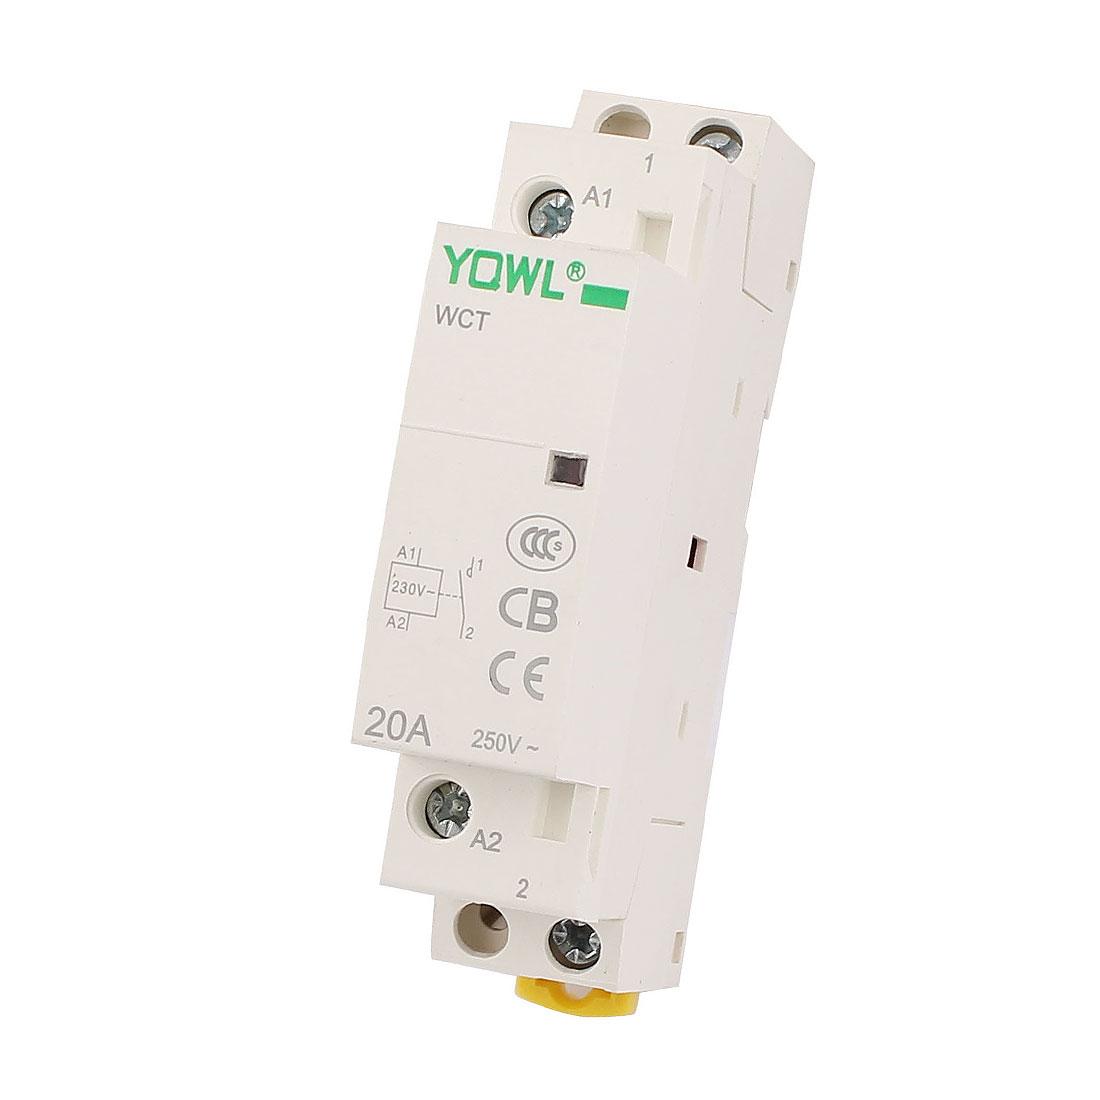 Household 1-Pole 1NO AC Power Contactor Modular Coil AC 250V 20A